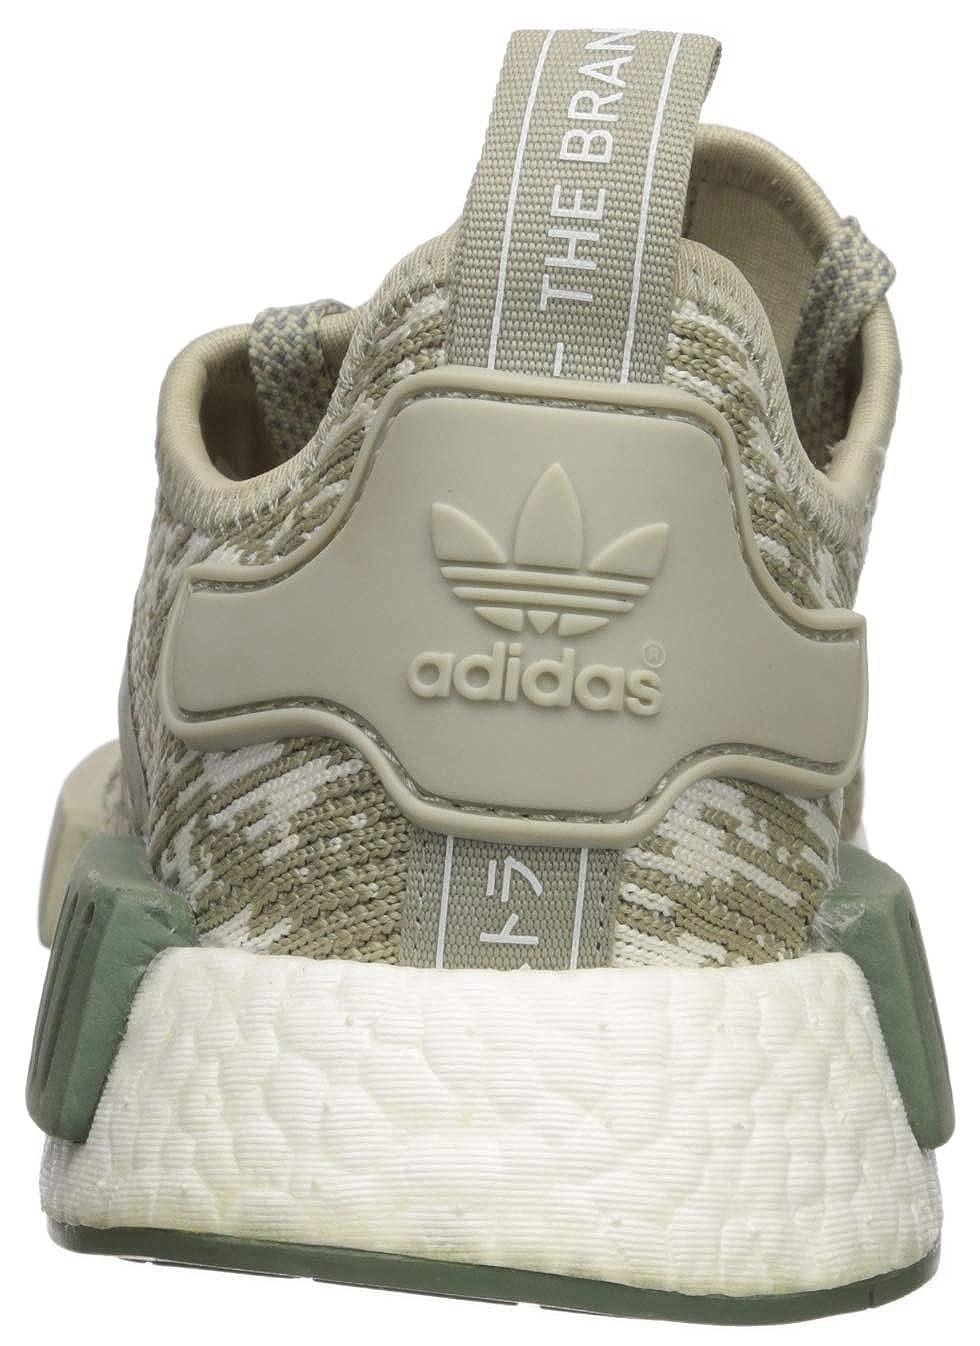 adidas Originals Mens NMD/_r1 Running Shoe